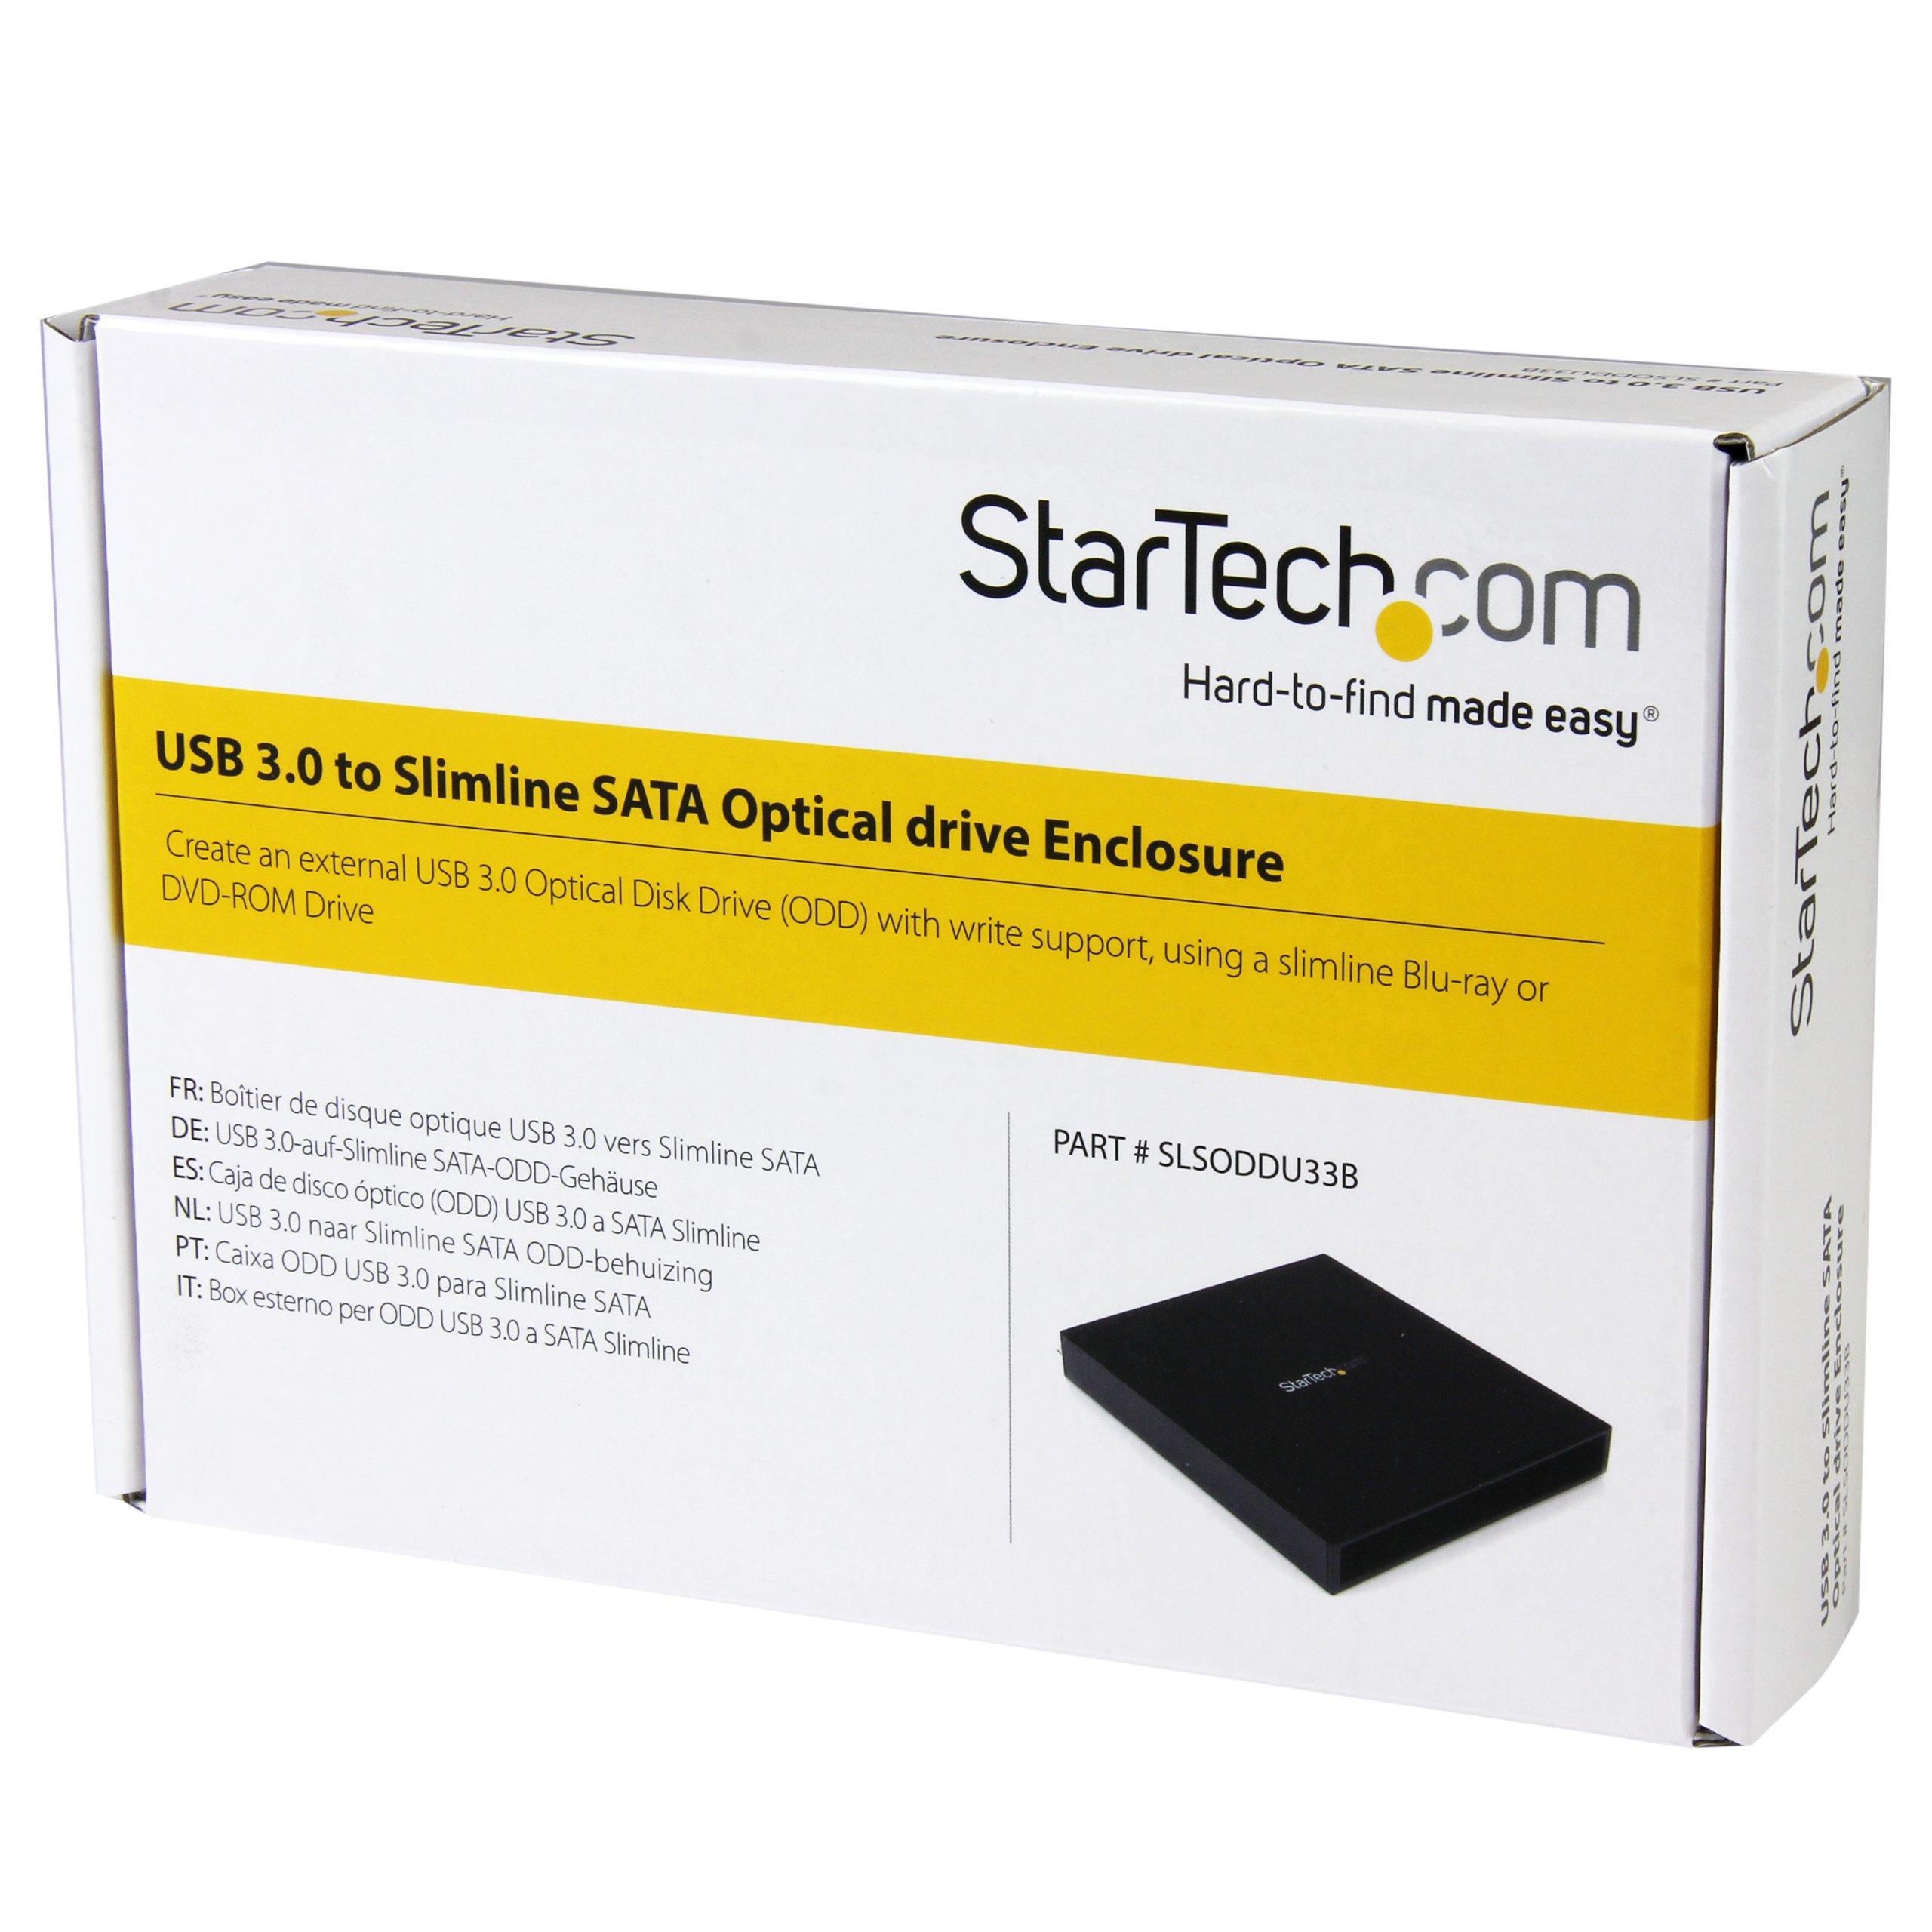 USB 3.0 to Slimline SATA ODD Enclosure for Blu-ray & DVD ROM Drives - Portable Optical Disk Drive Enclosure - Solid Aluminum